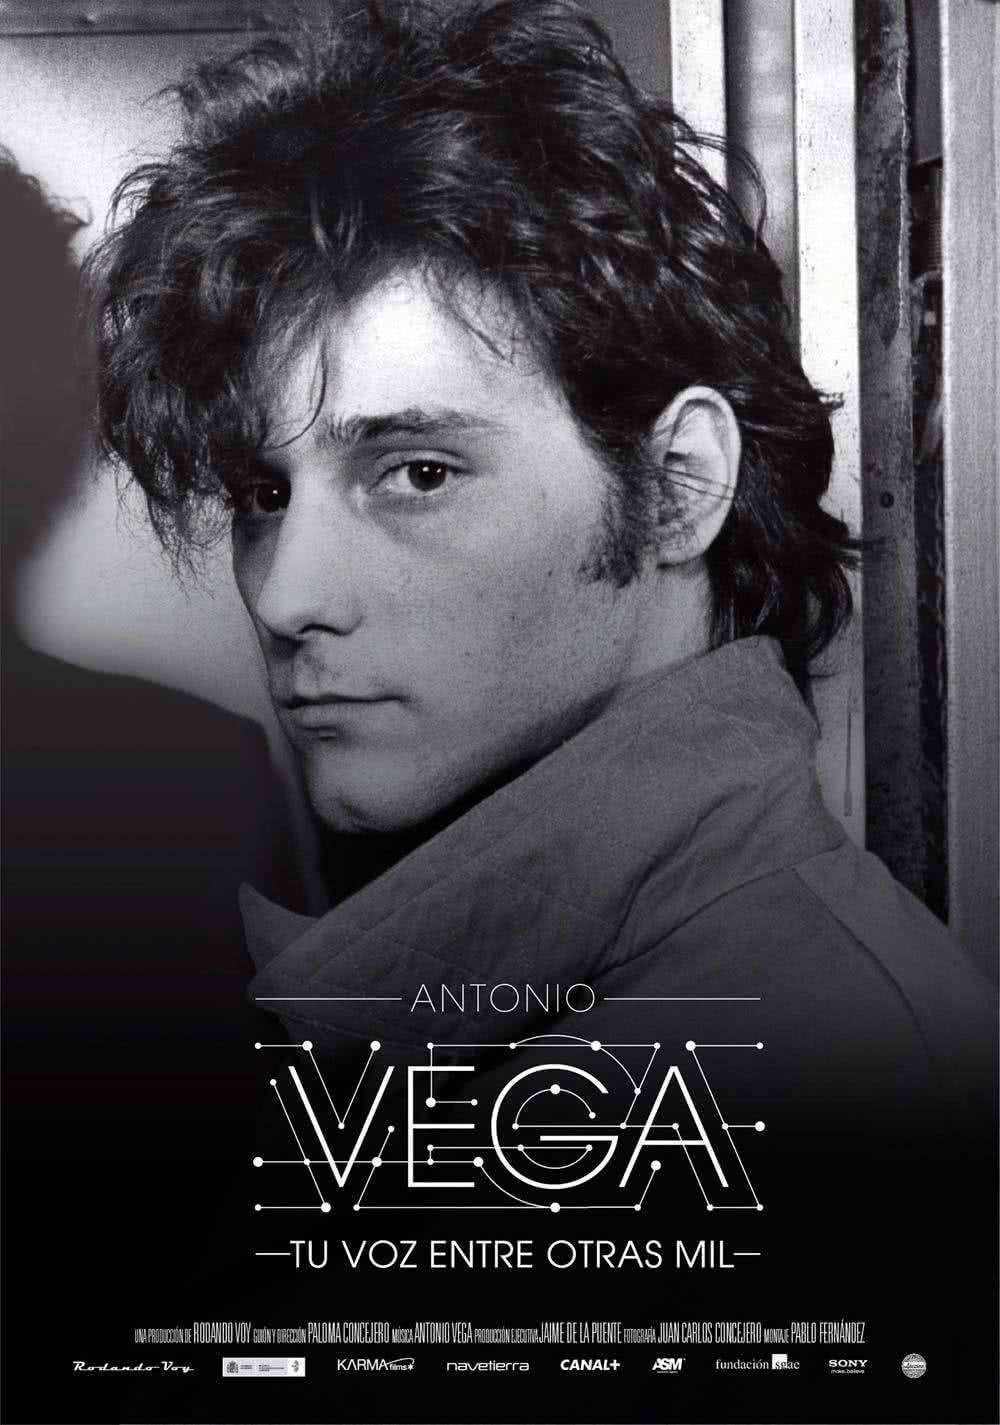 Documentales - Página 5 Antonio-Vega-Tu-voz-entre-otras-mil-Cartel